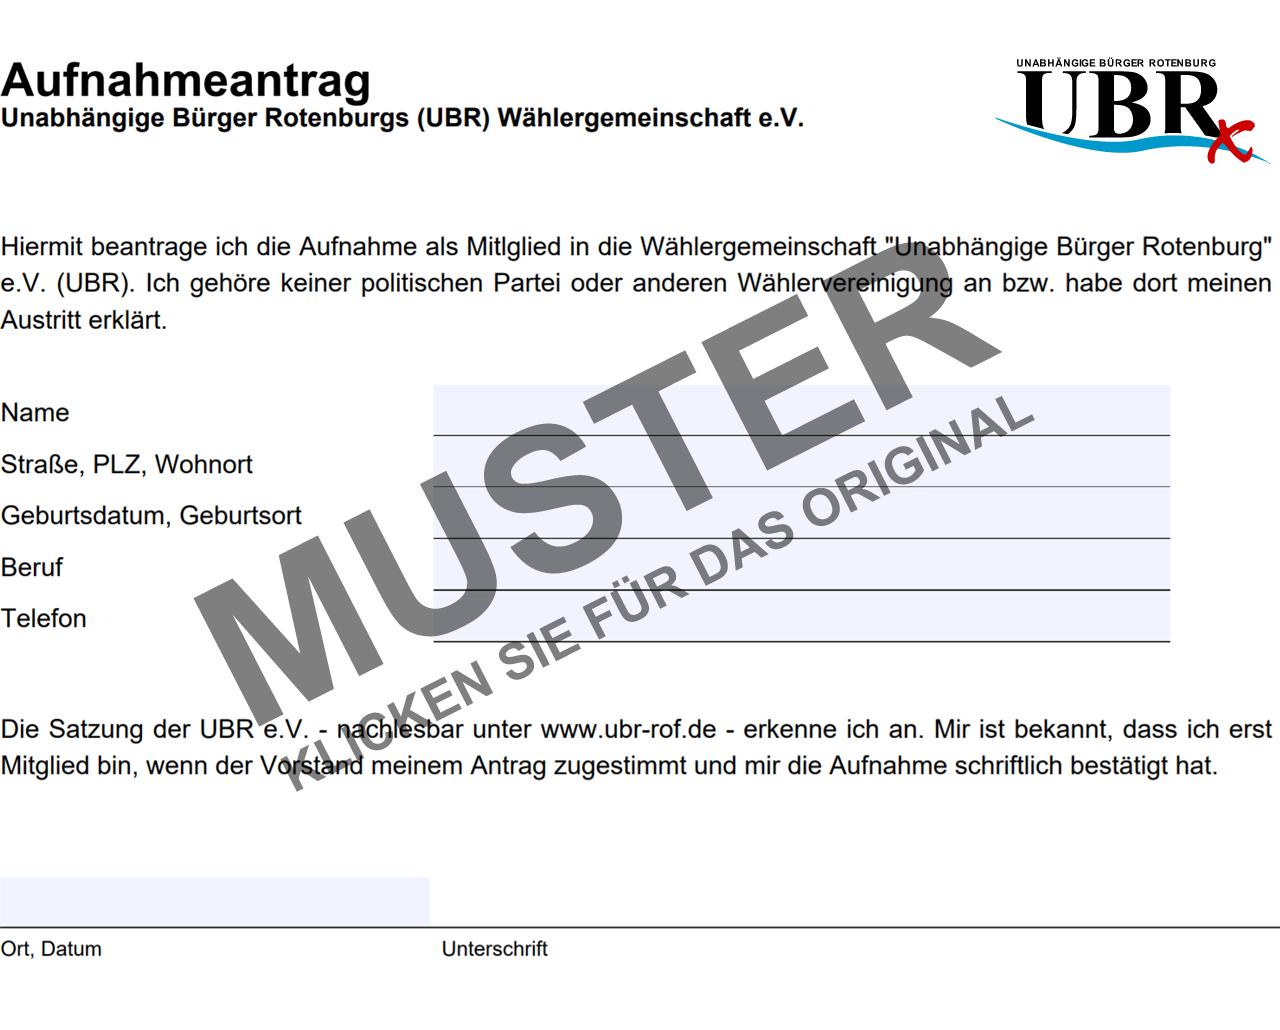 UBR Mitgliedschaftsantrag